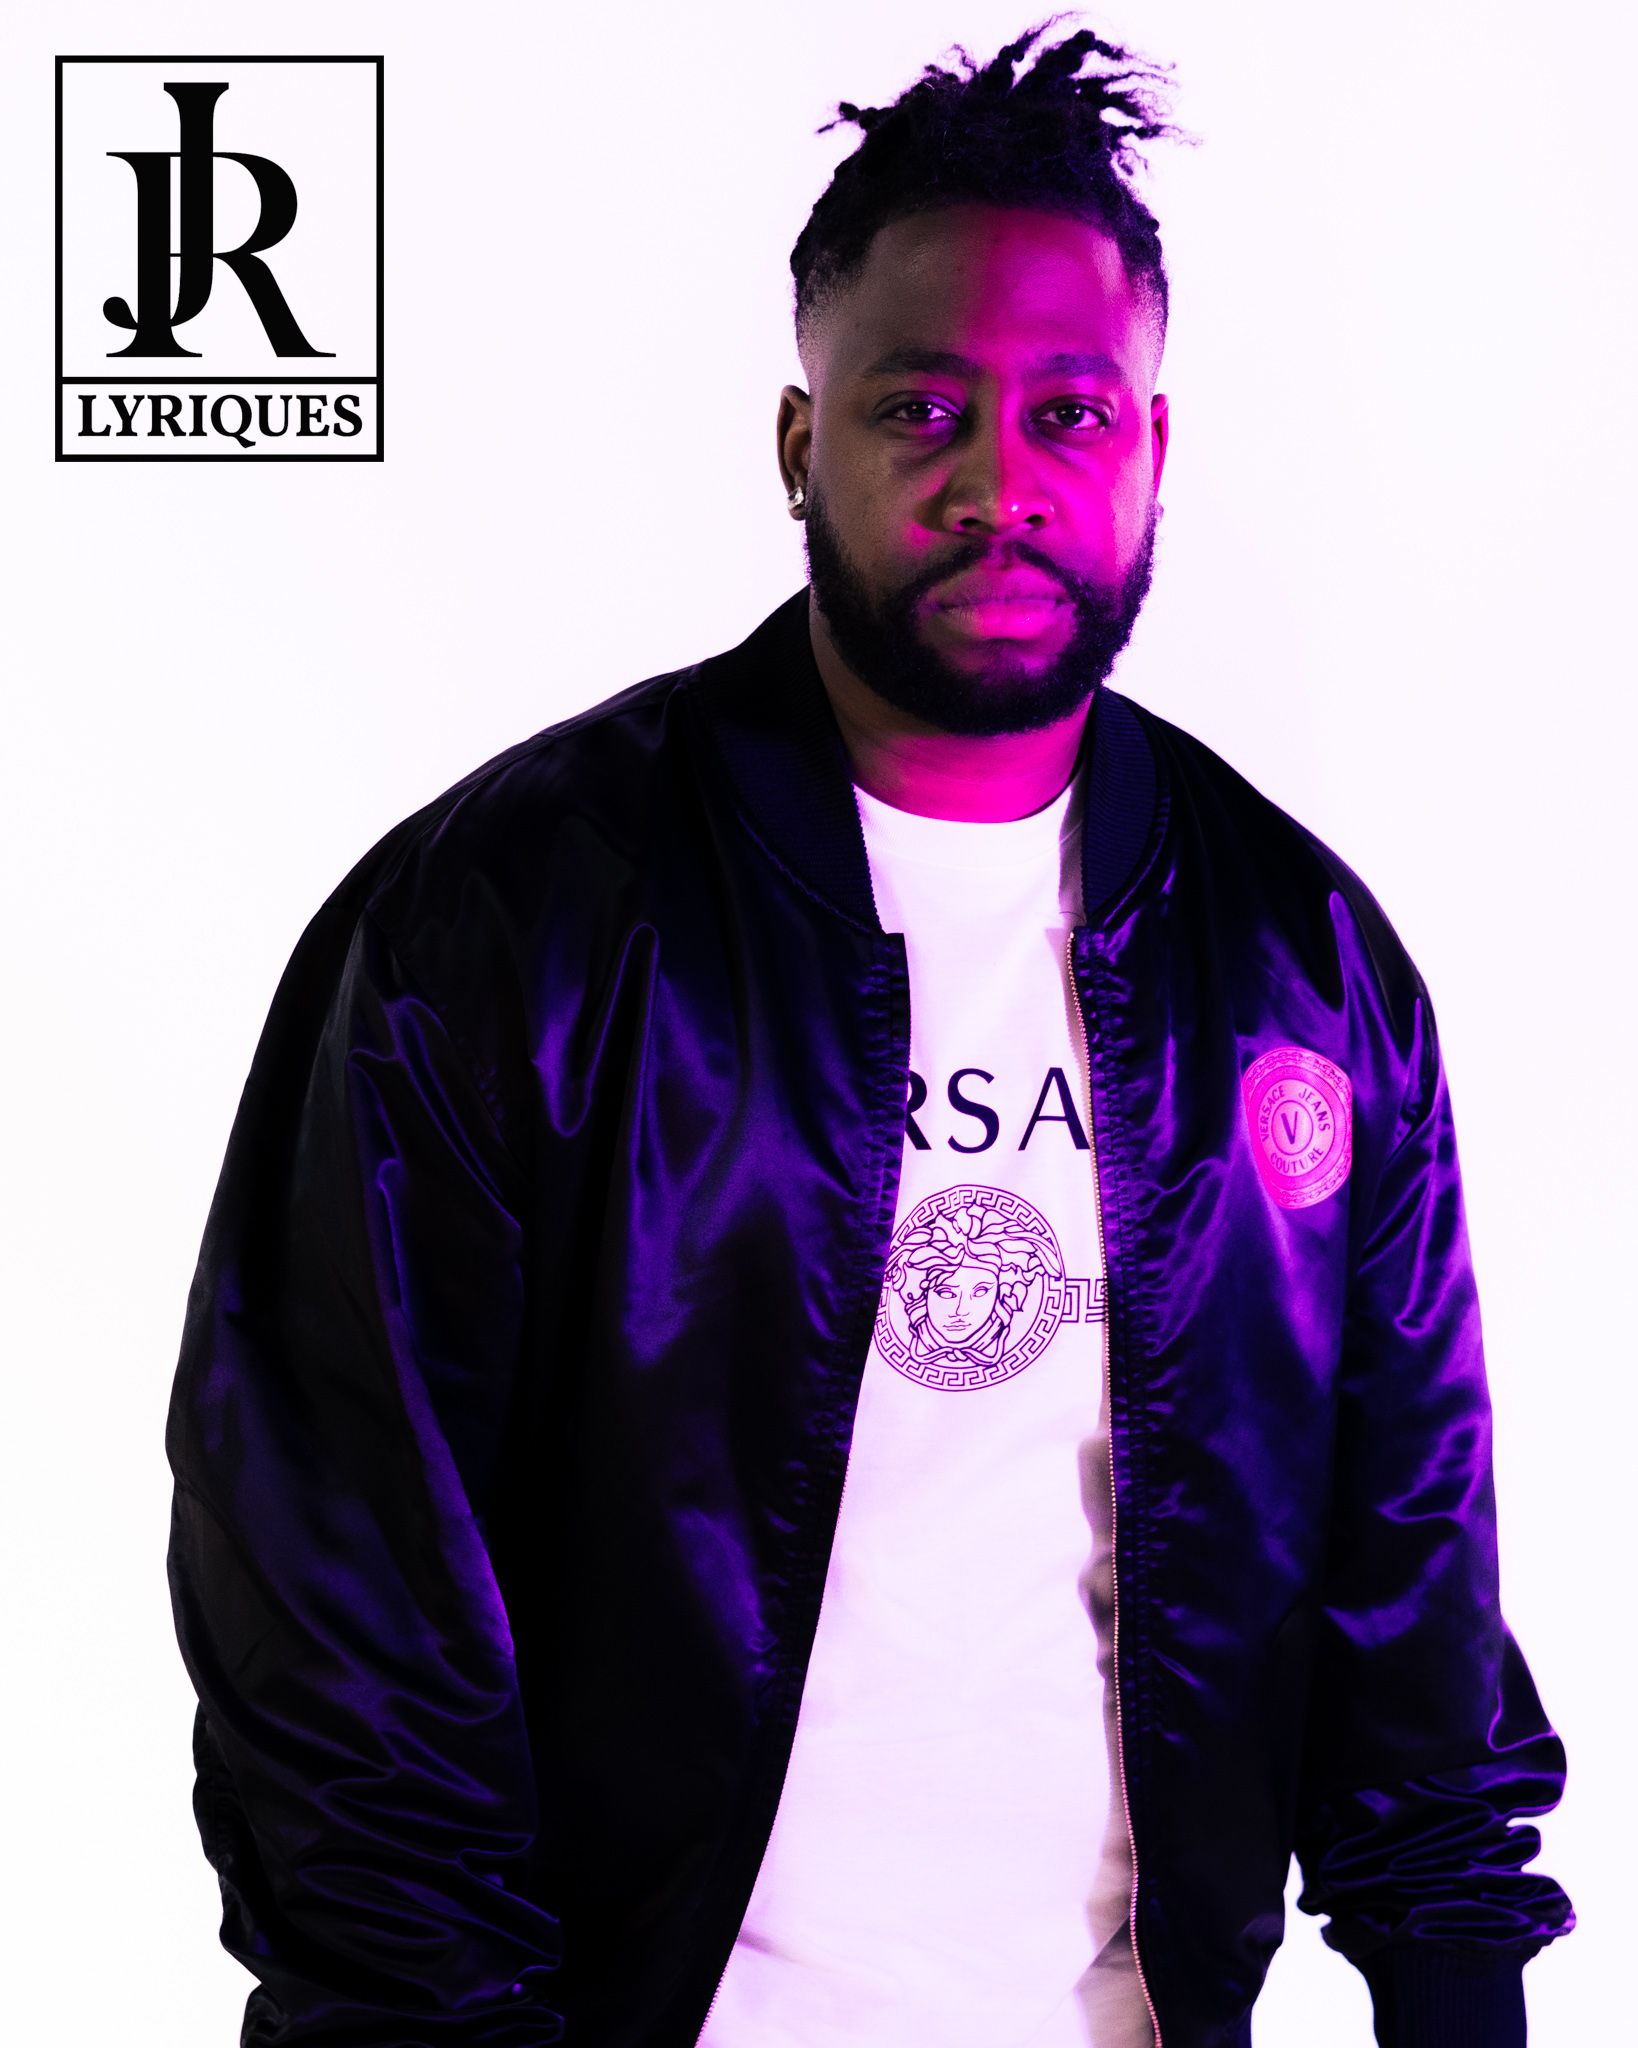 Blending Immersive and Euphonic Pop Rhythms: Rising Chicago-Based Artist JR Lyriques Unveils New Pop Single